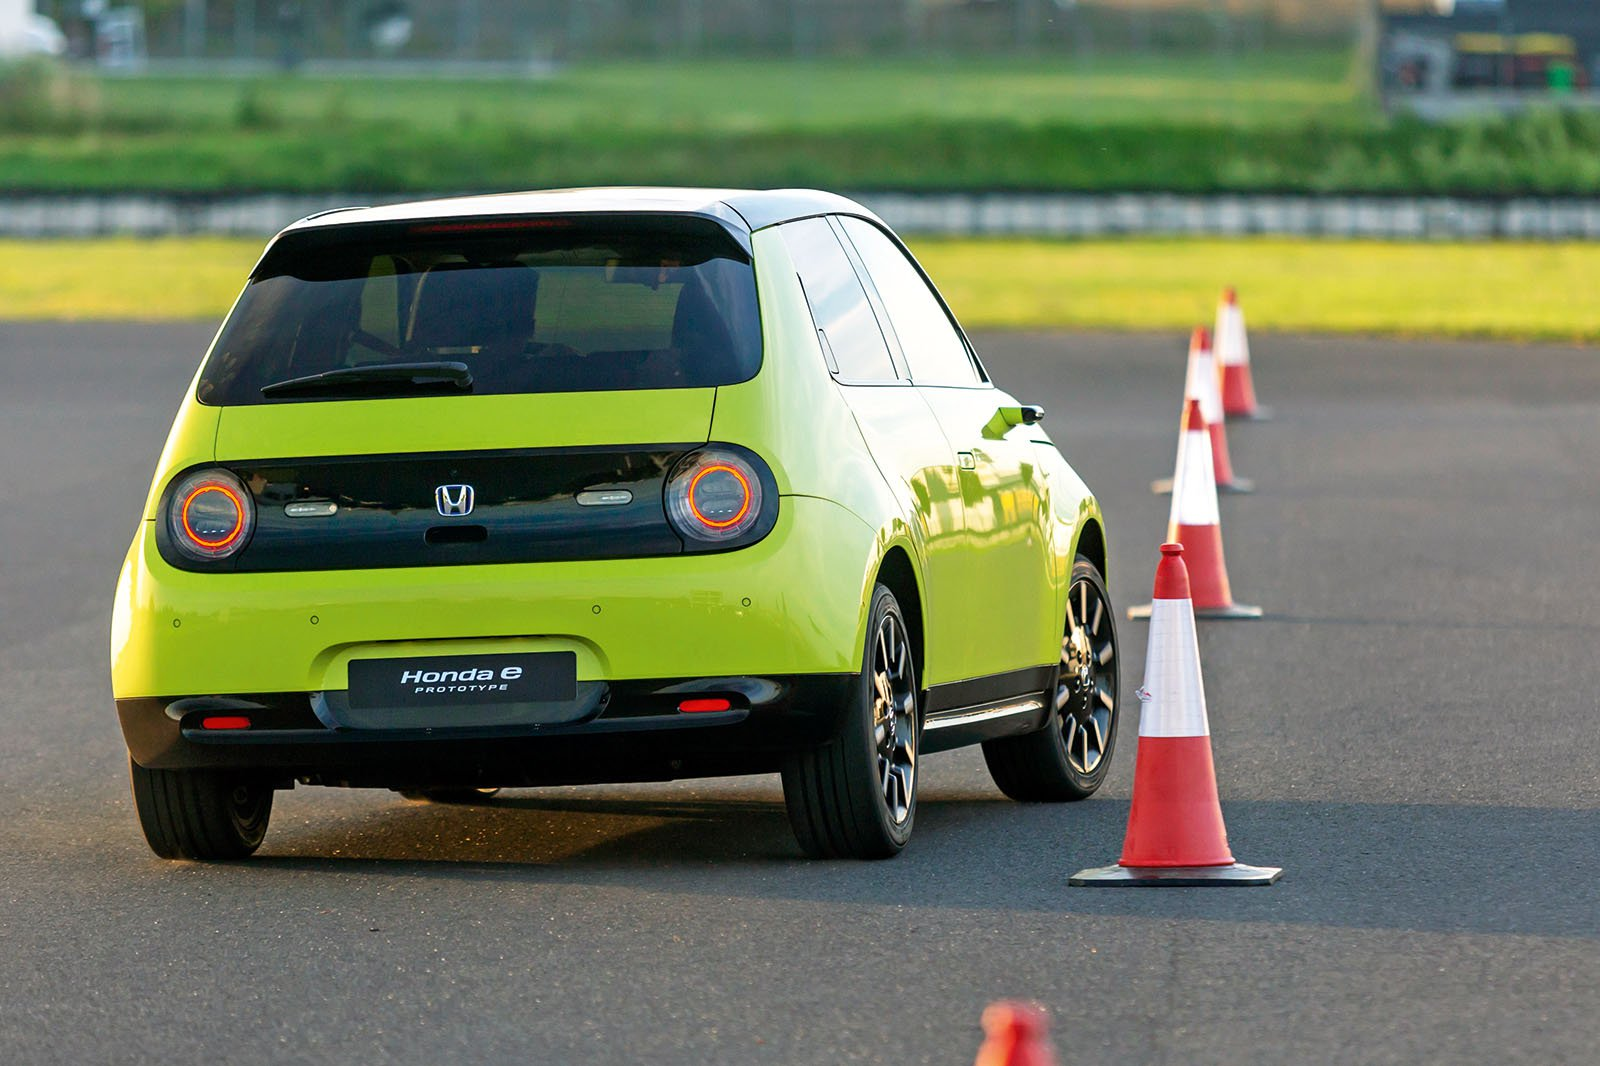 Honda E driving